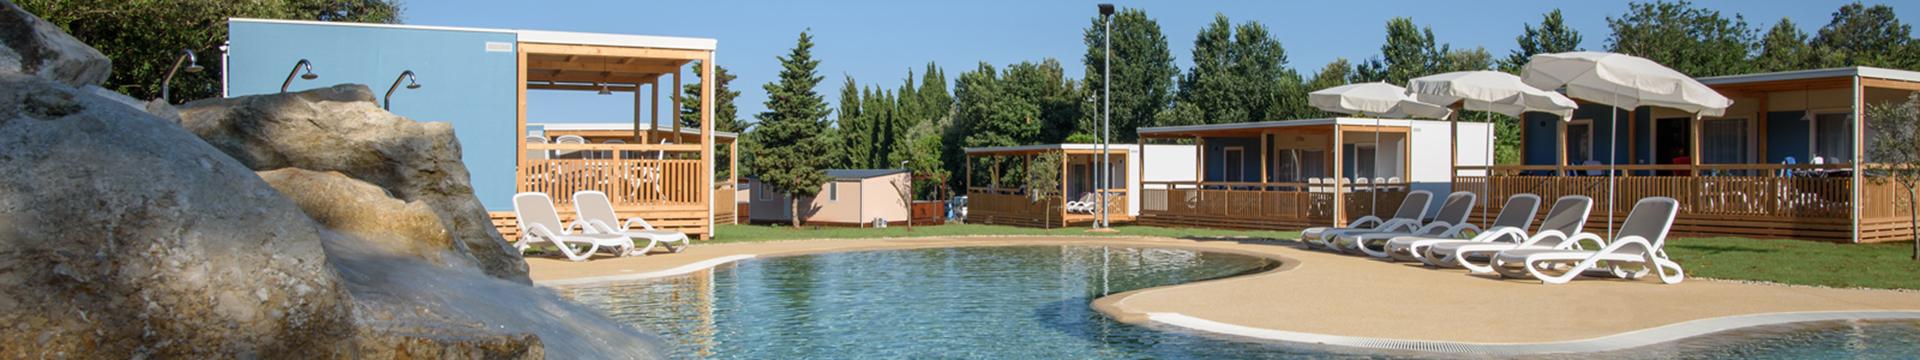 Neuigkeiten in 2016. – Campingplatz Polari